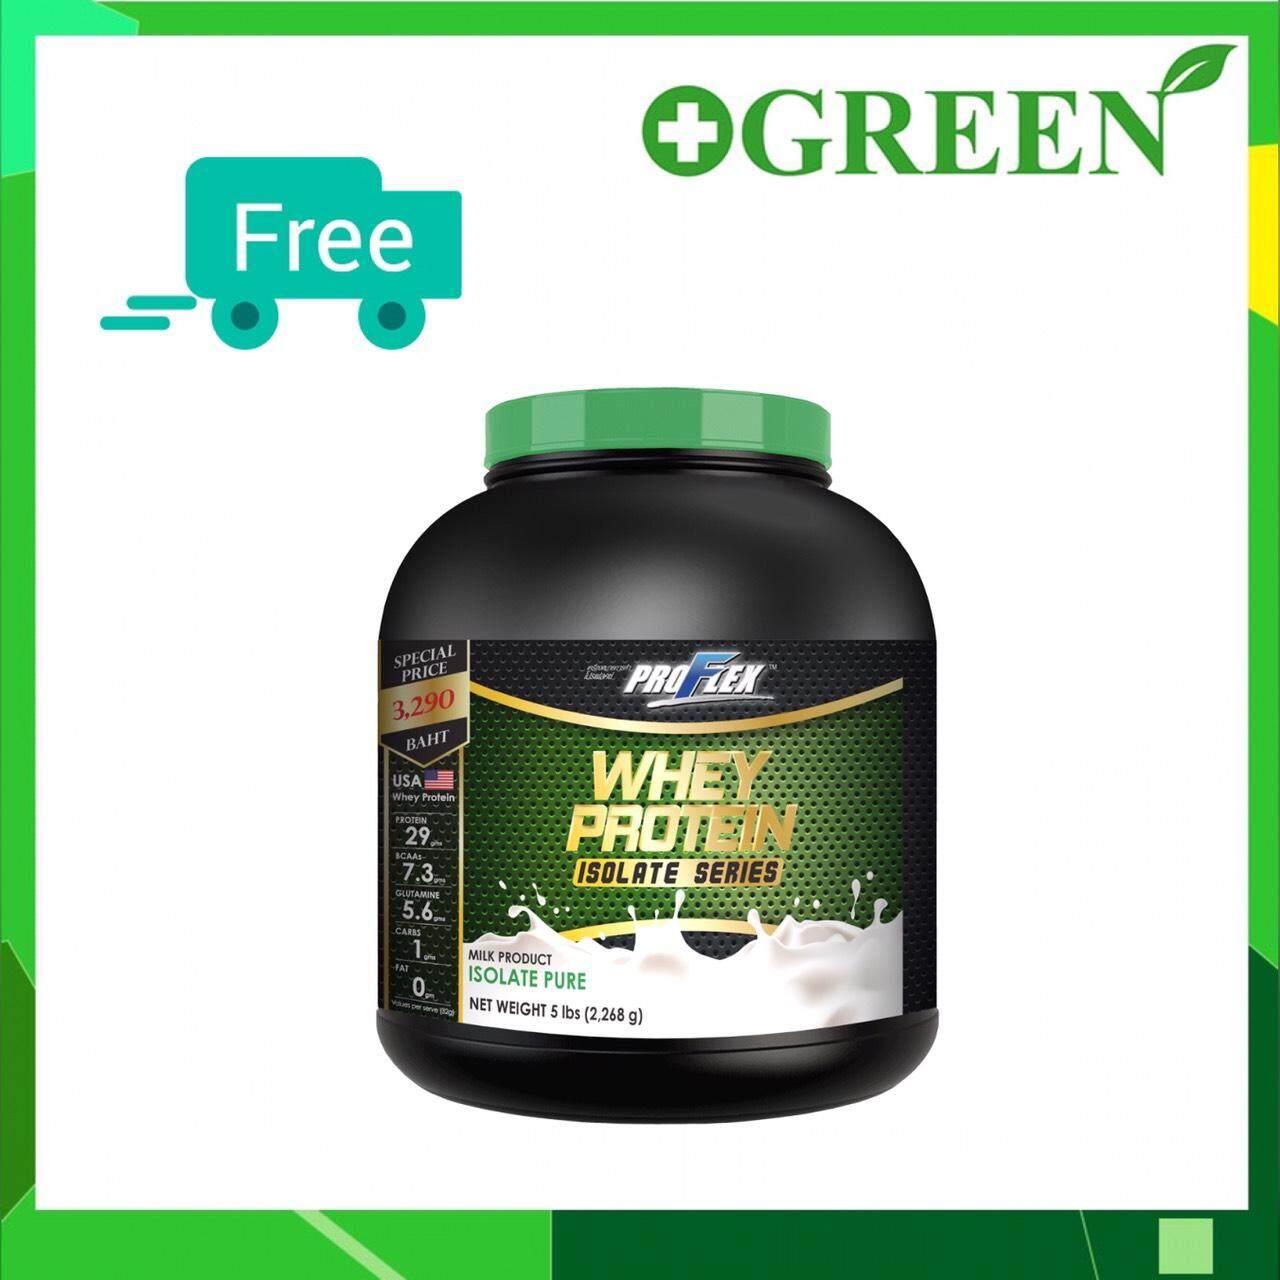 ProFlex Whey Protein Isolate Pure 5 Lbs. เวย์โปรตีน ไอโซเลท รสจืด ขนาด 5 ปอนด์